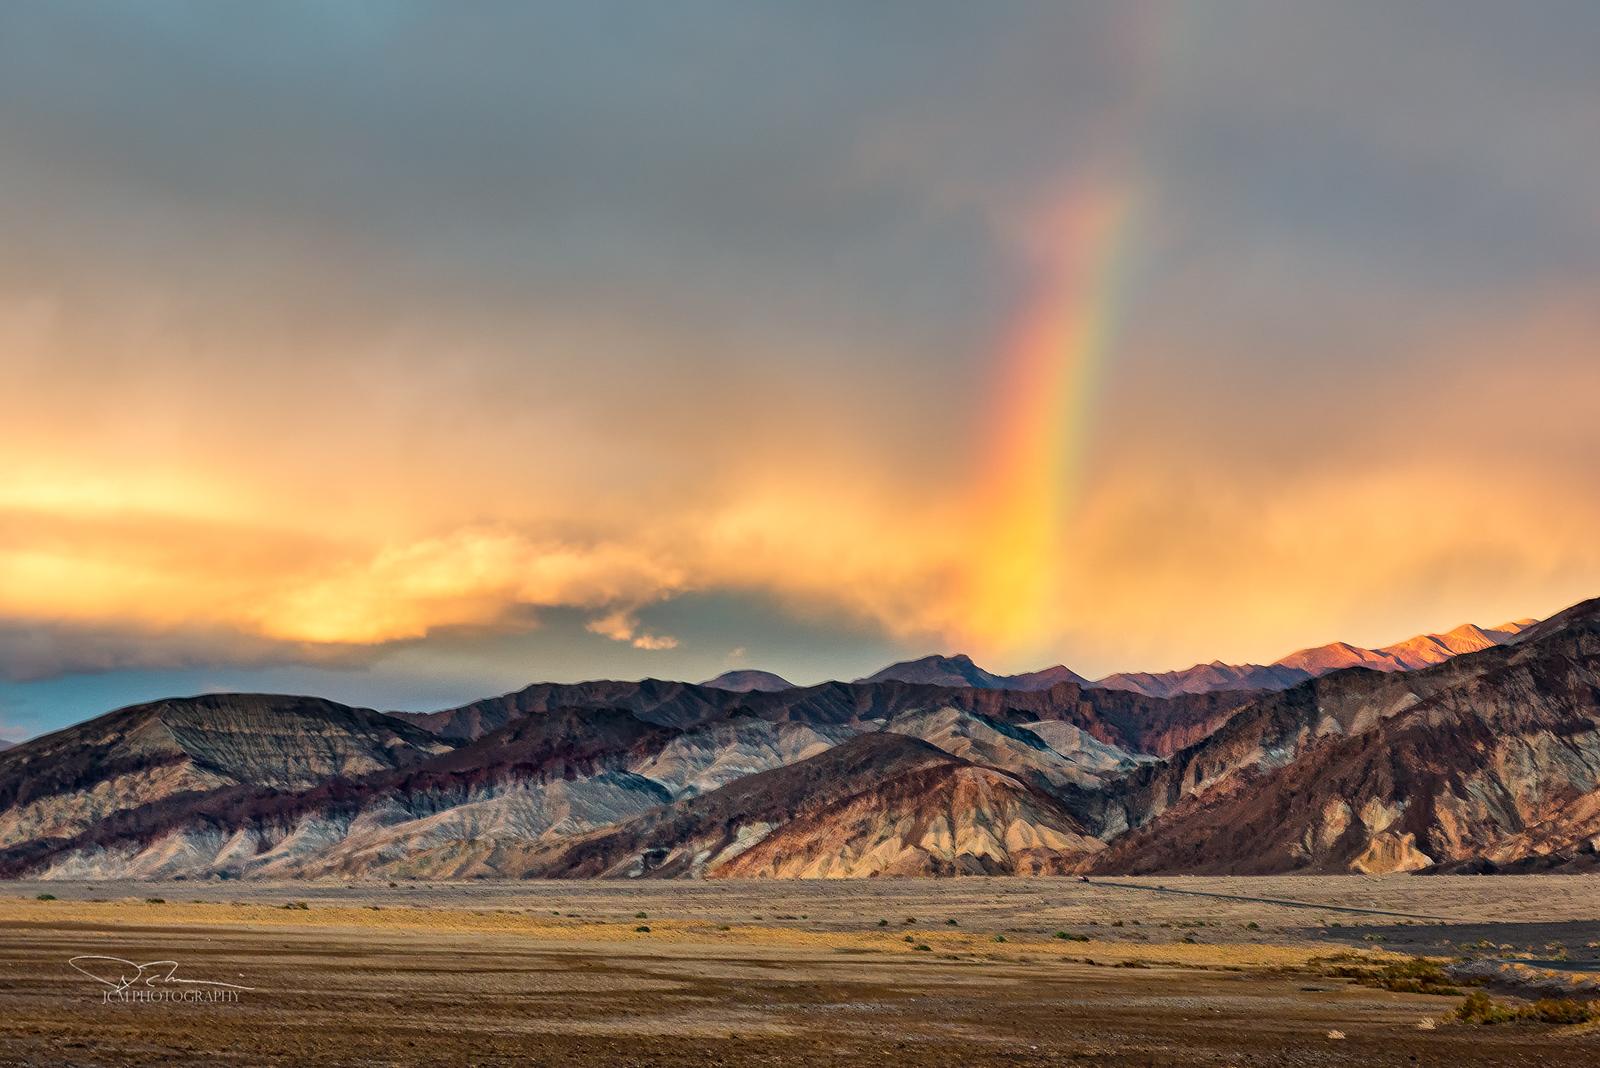 Rainbow over Death Valley